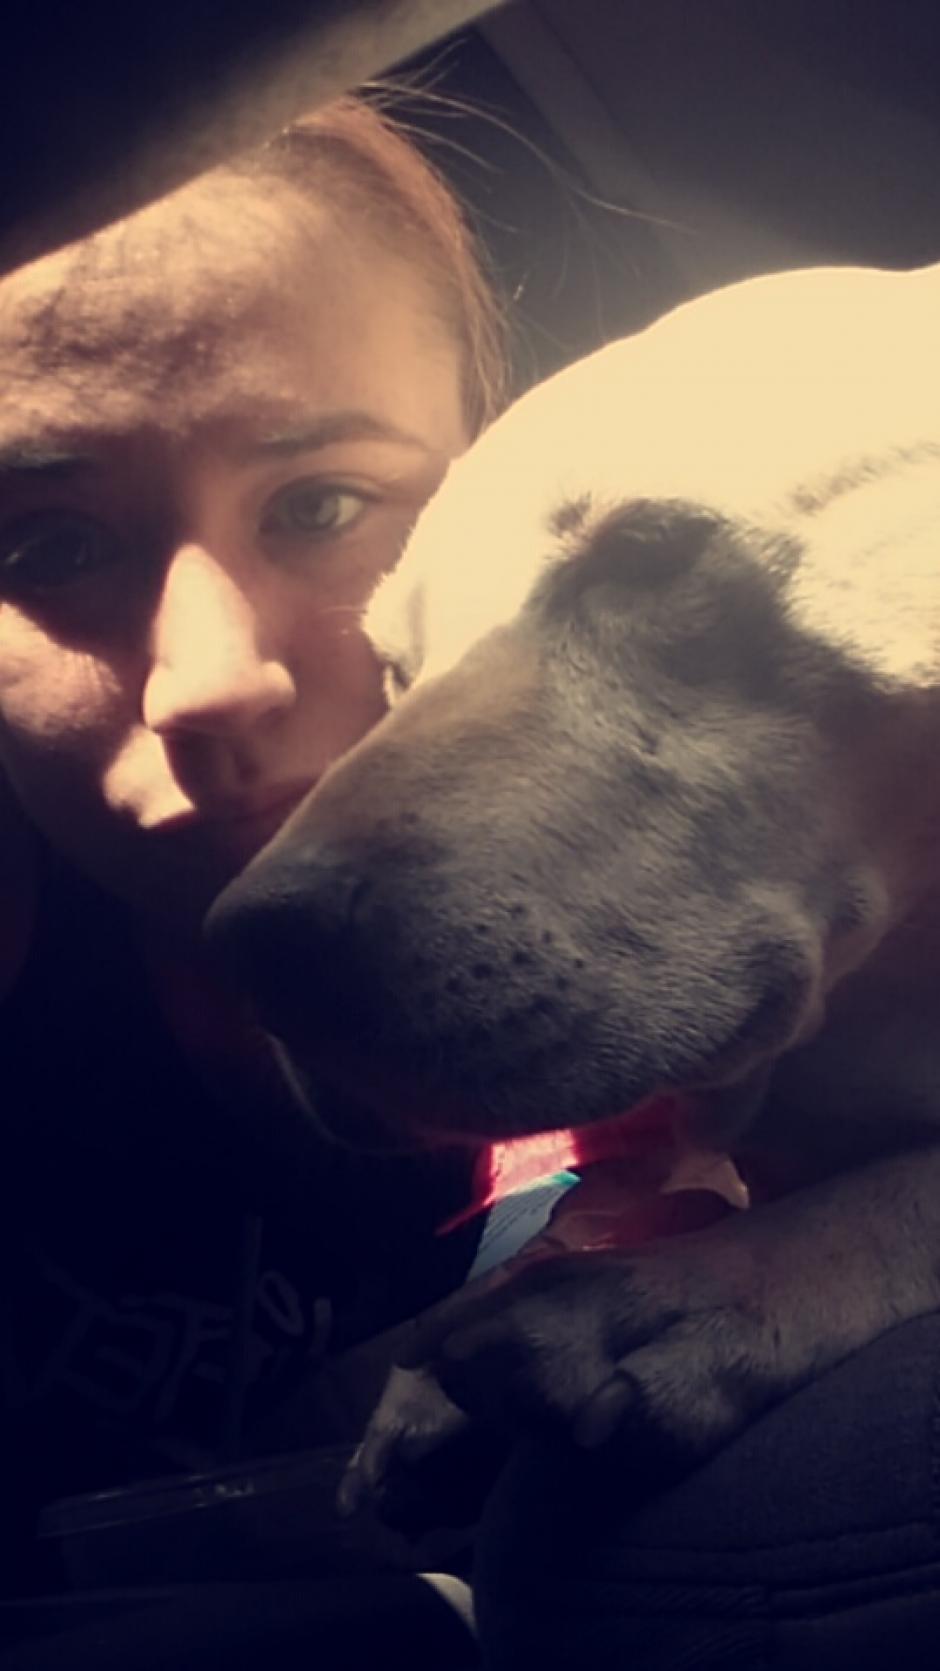 El amor hacia Hannah ilumina sus rostros. (Foto: Snapchat)